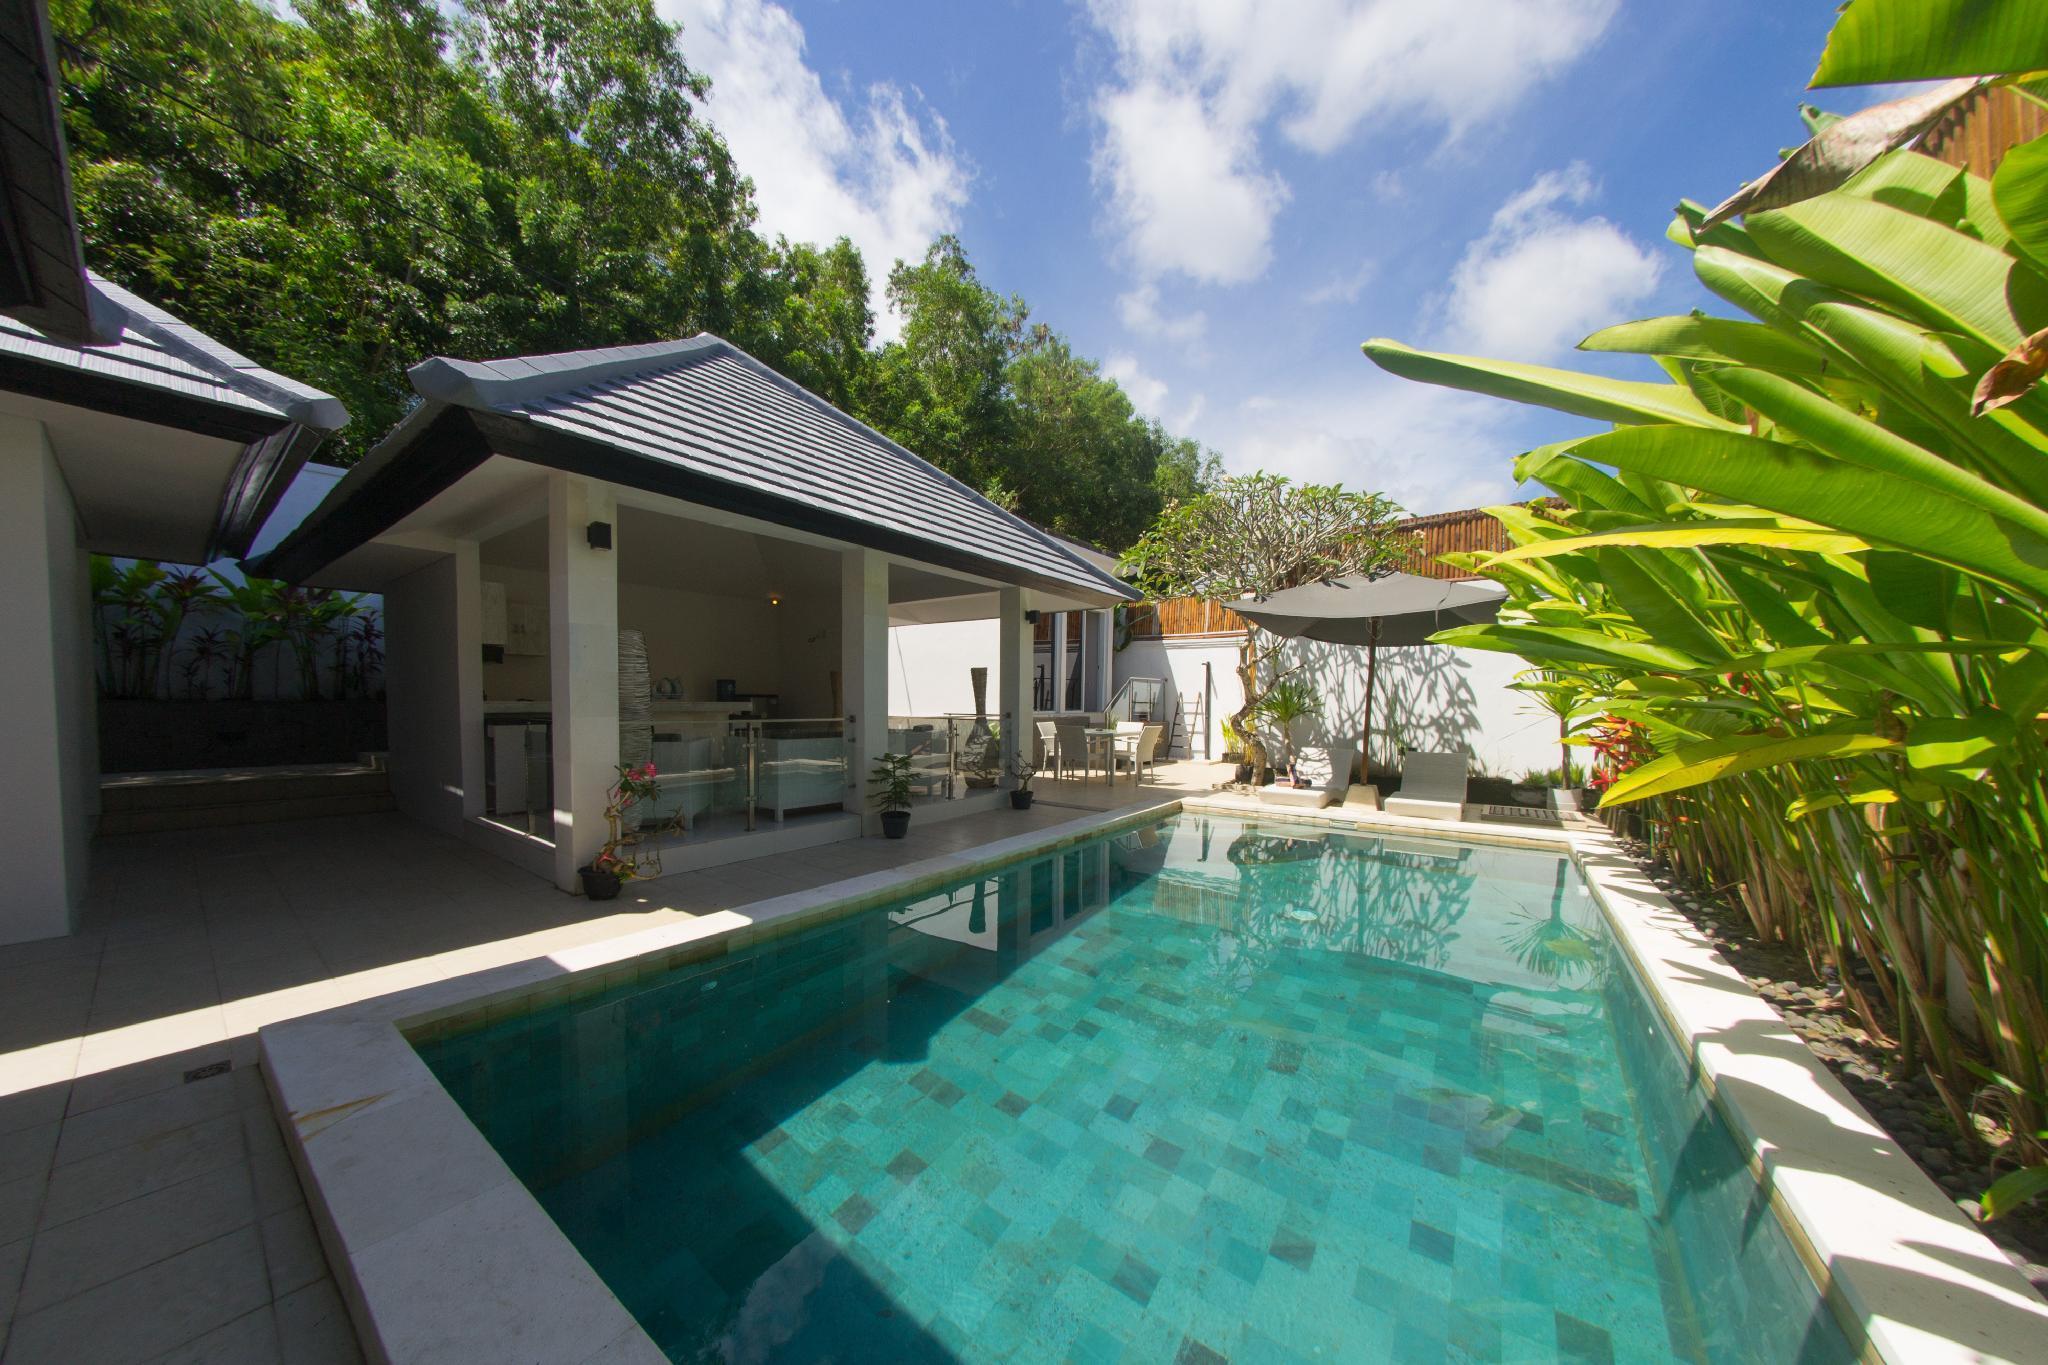 Minimalist Modern Three Bedroom Villa In An Ideal Location For Traveling In Bali